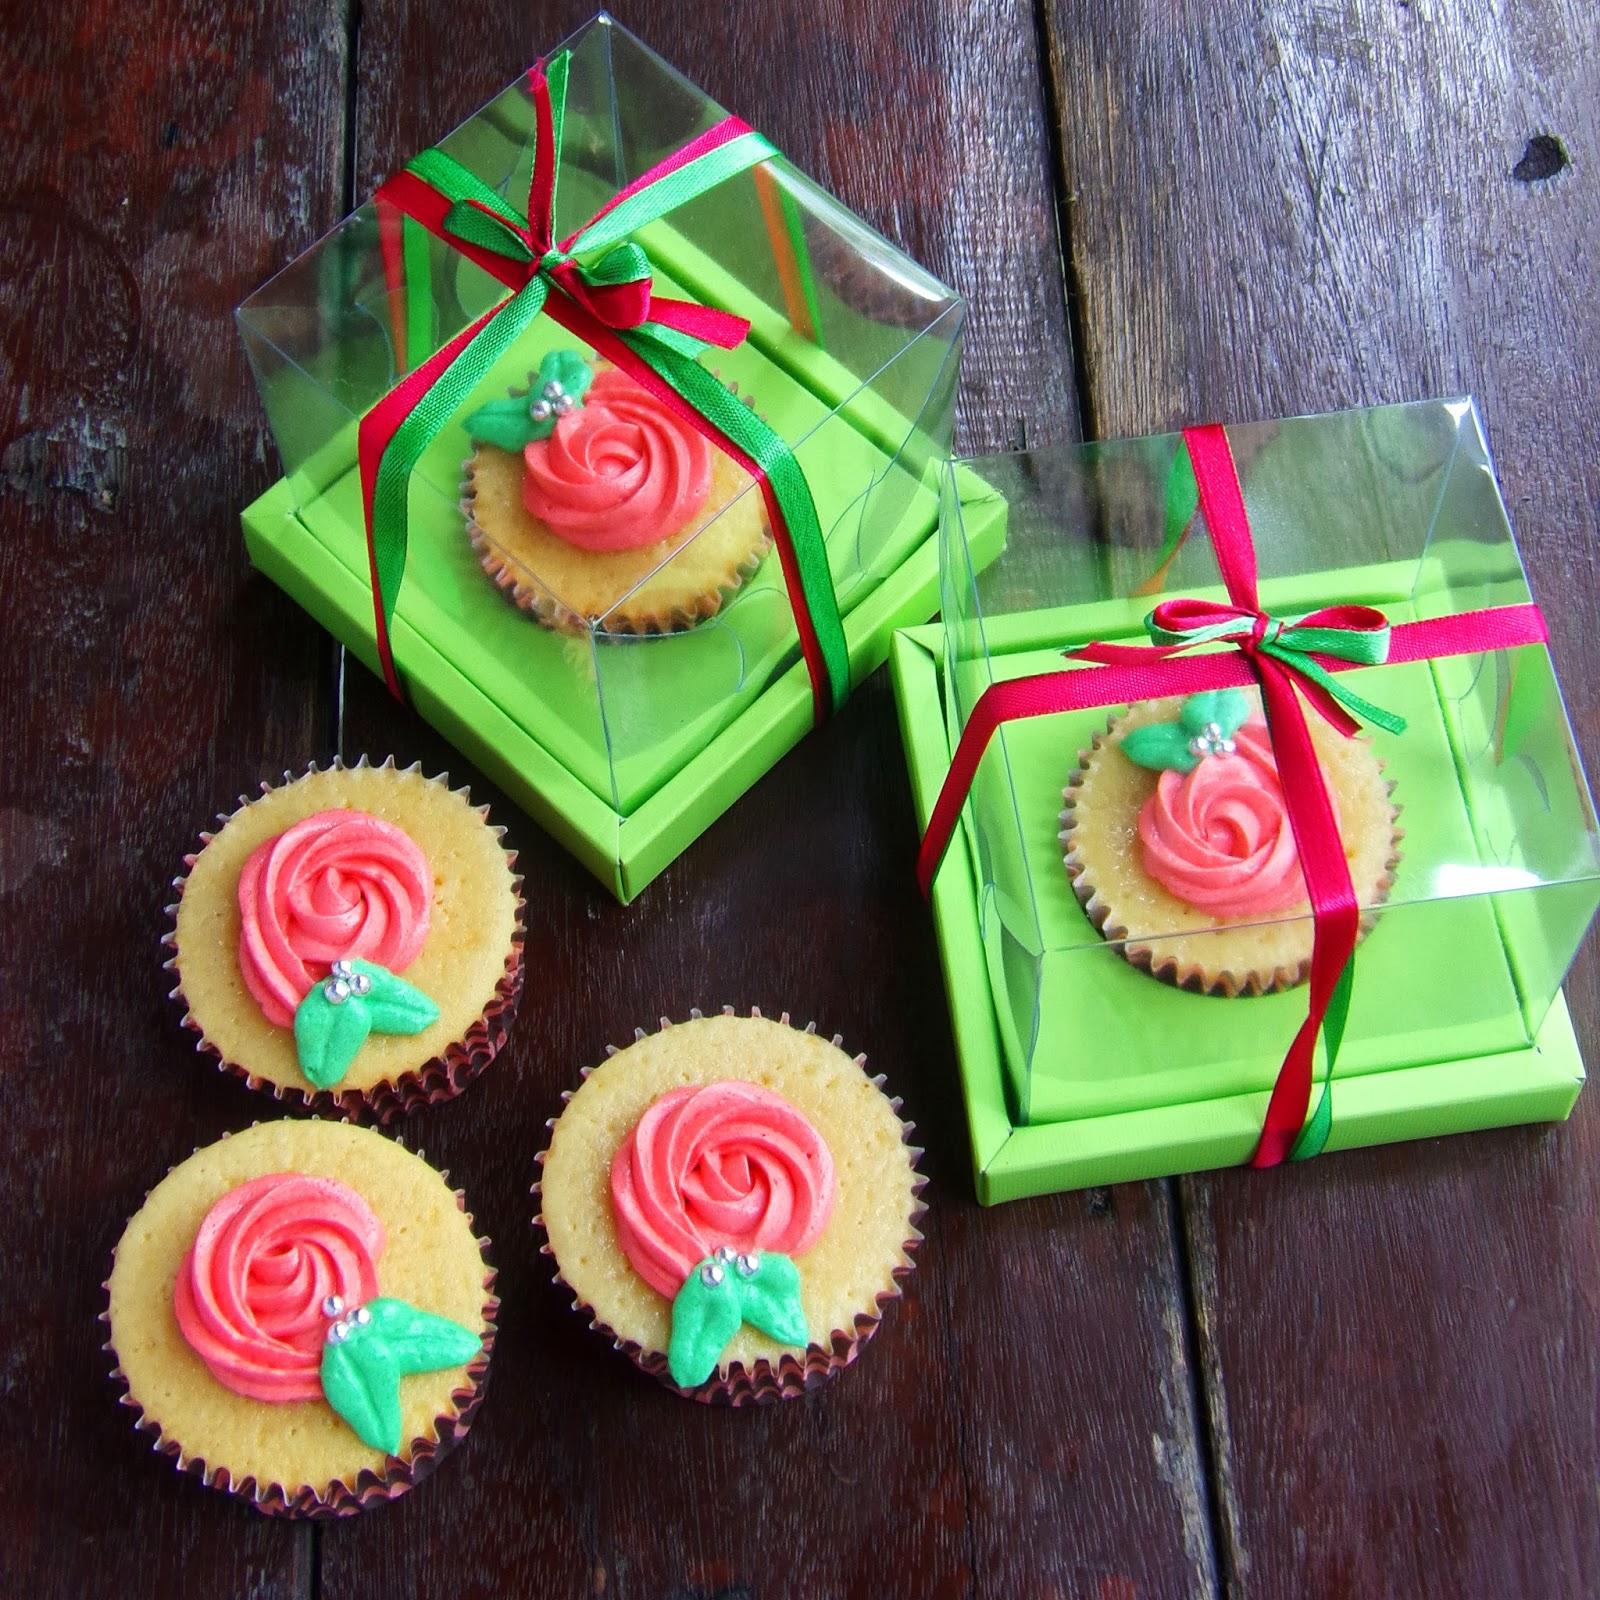 Wedding Cupcakes Ideas: Wedding Cupcake 4: Vanilla Cupcakes With Cream Cheese